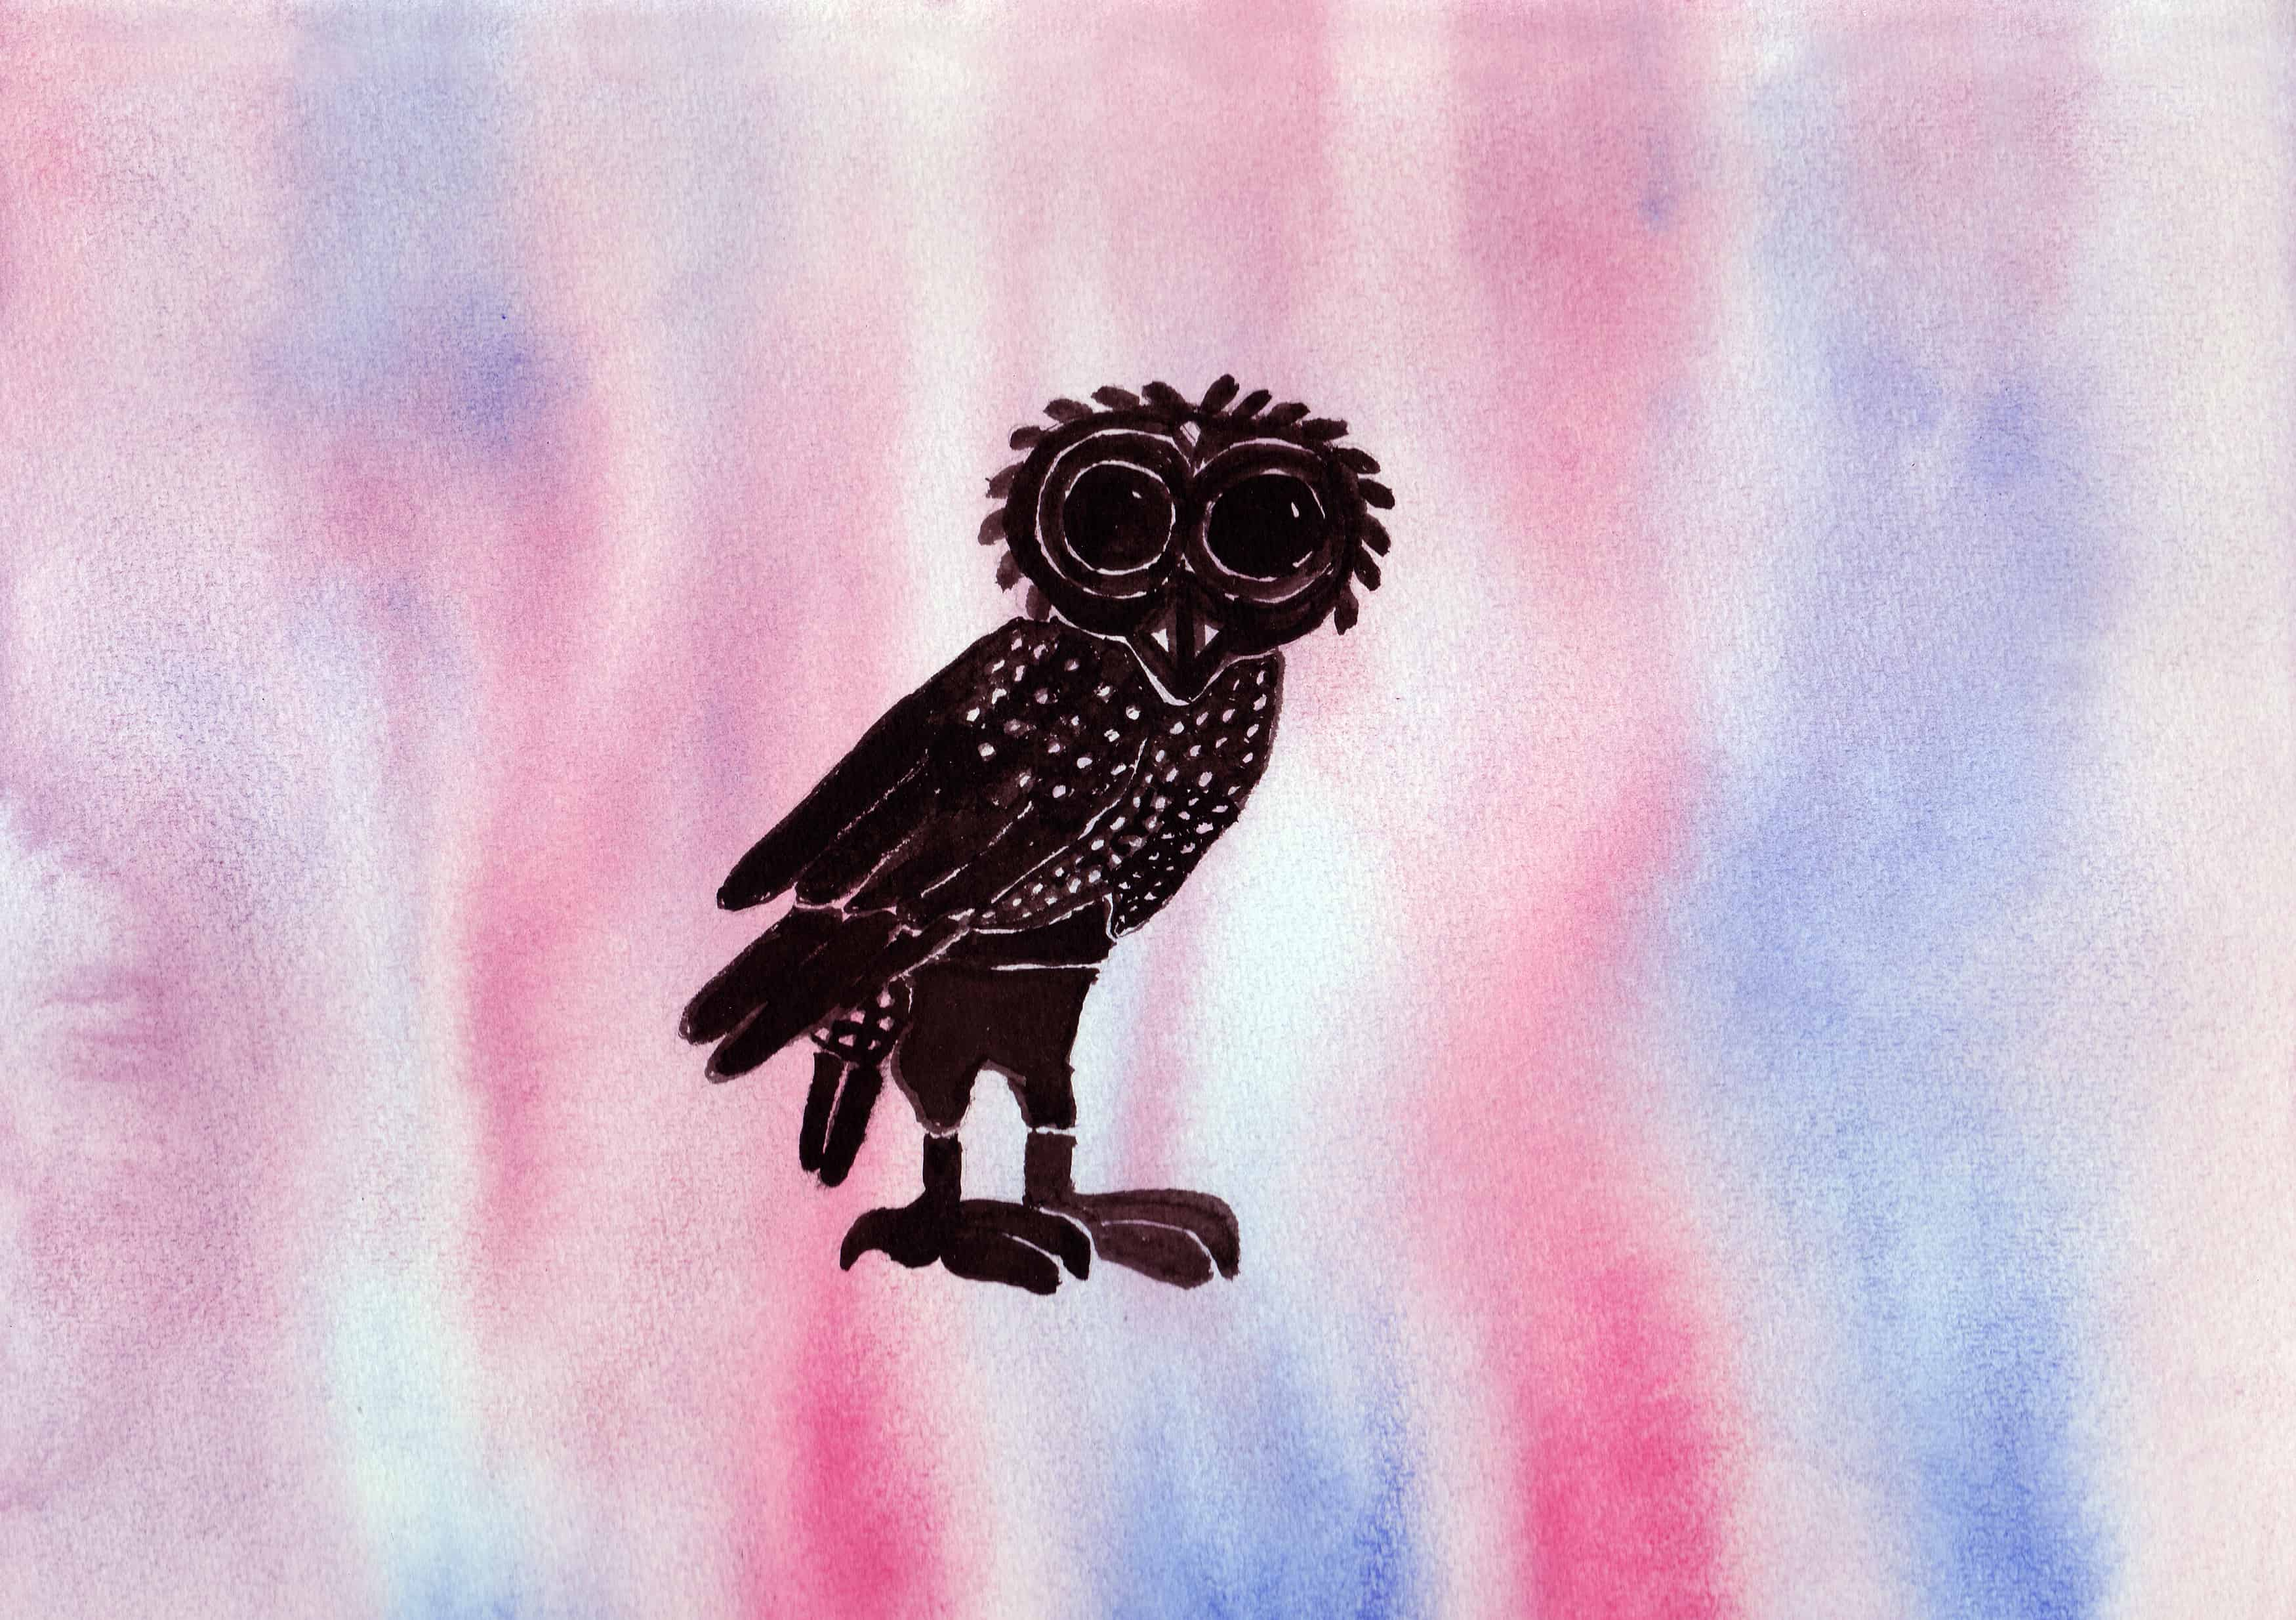 Athena's Owl - 100 Sacred Symbols in Watercolour by Linda Ursin